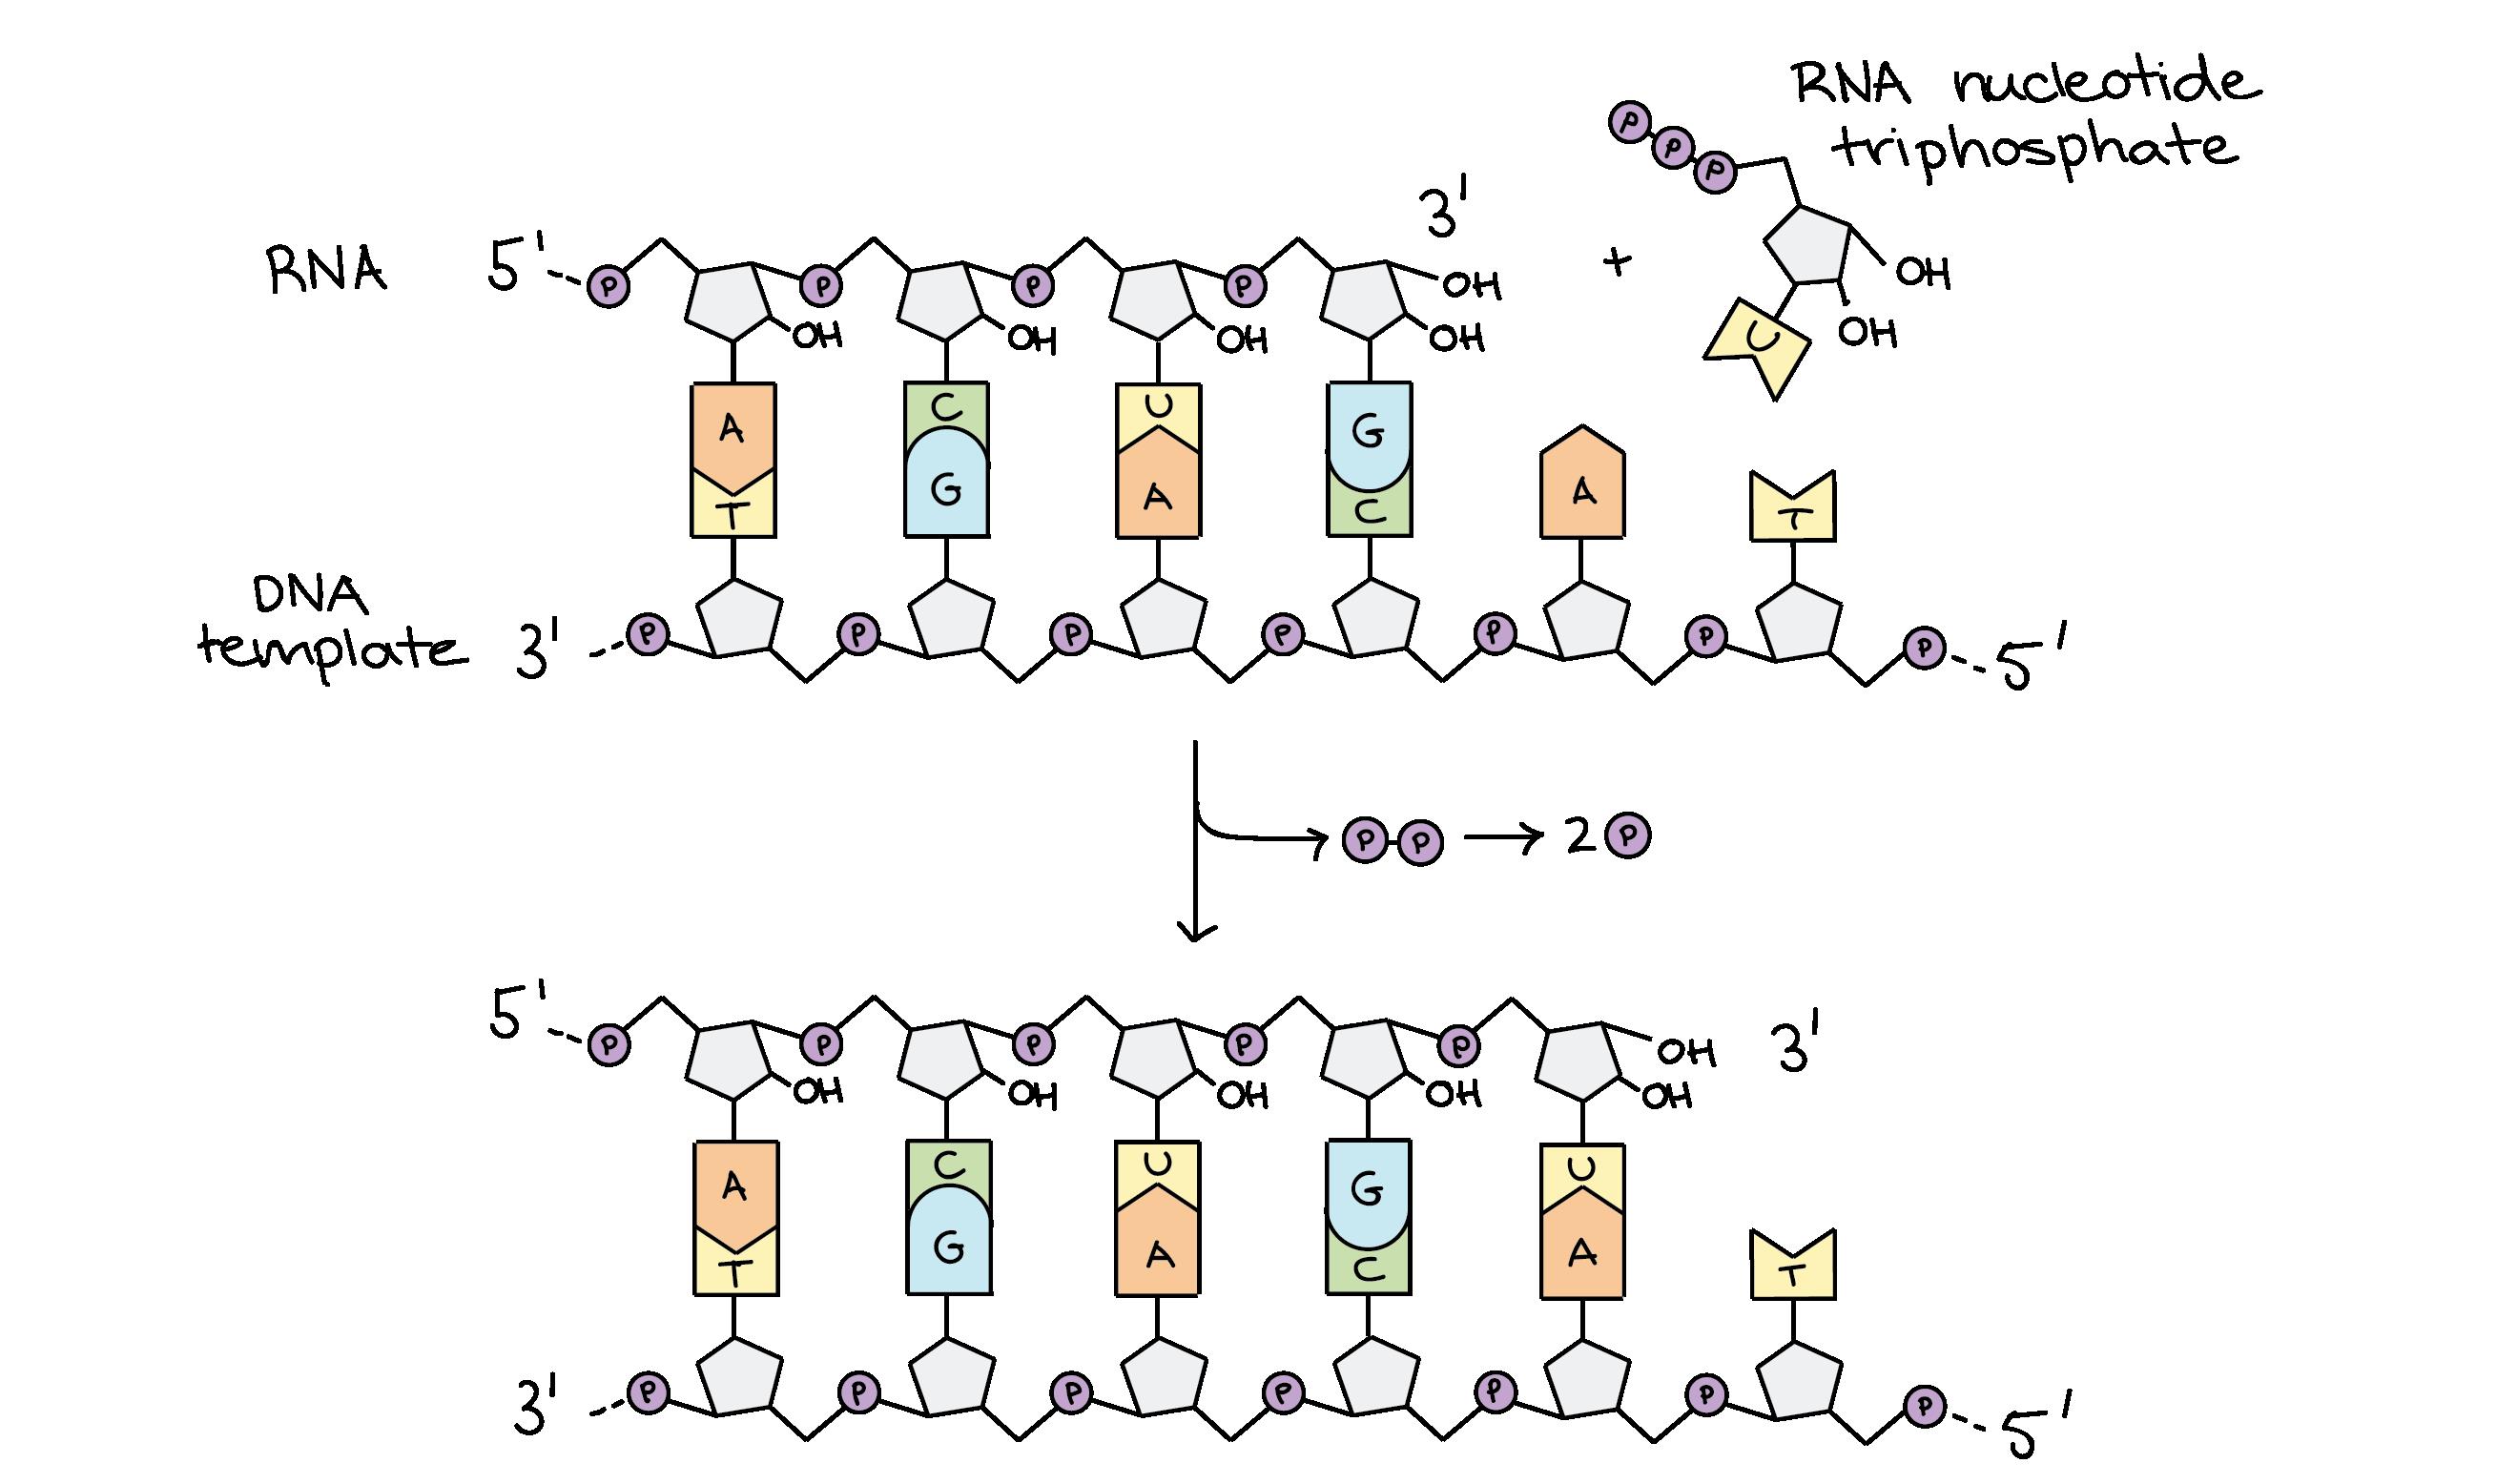 Stages Of Transcription Initiation Elongation Termination